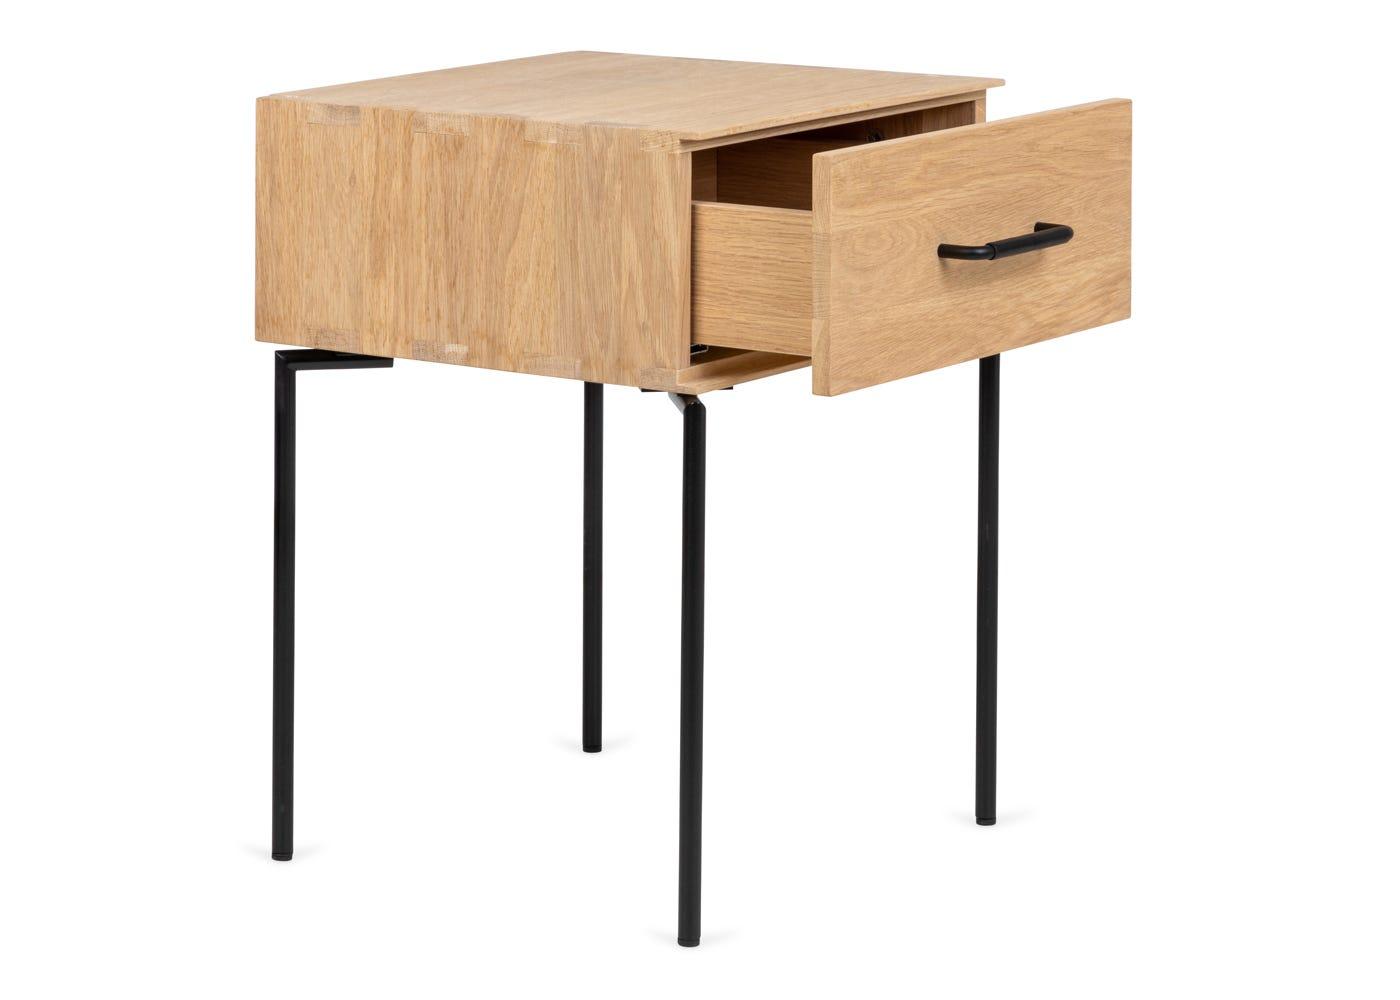 As shown: Marano bedside table - Side profile.